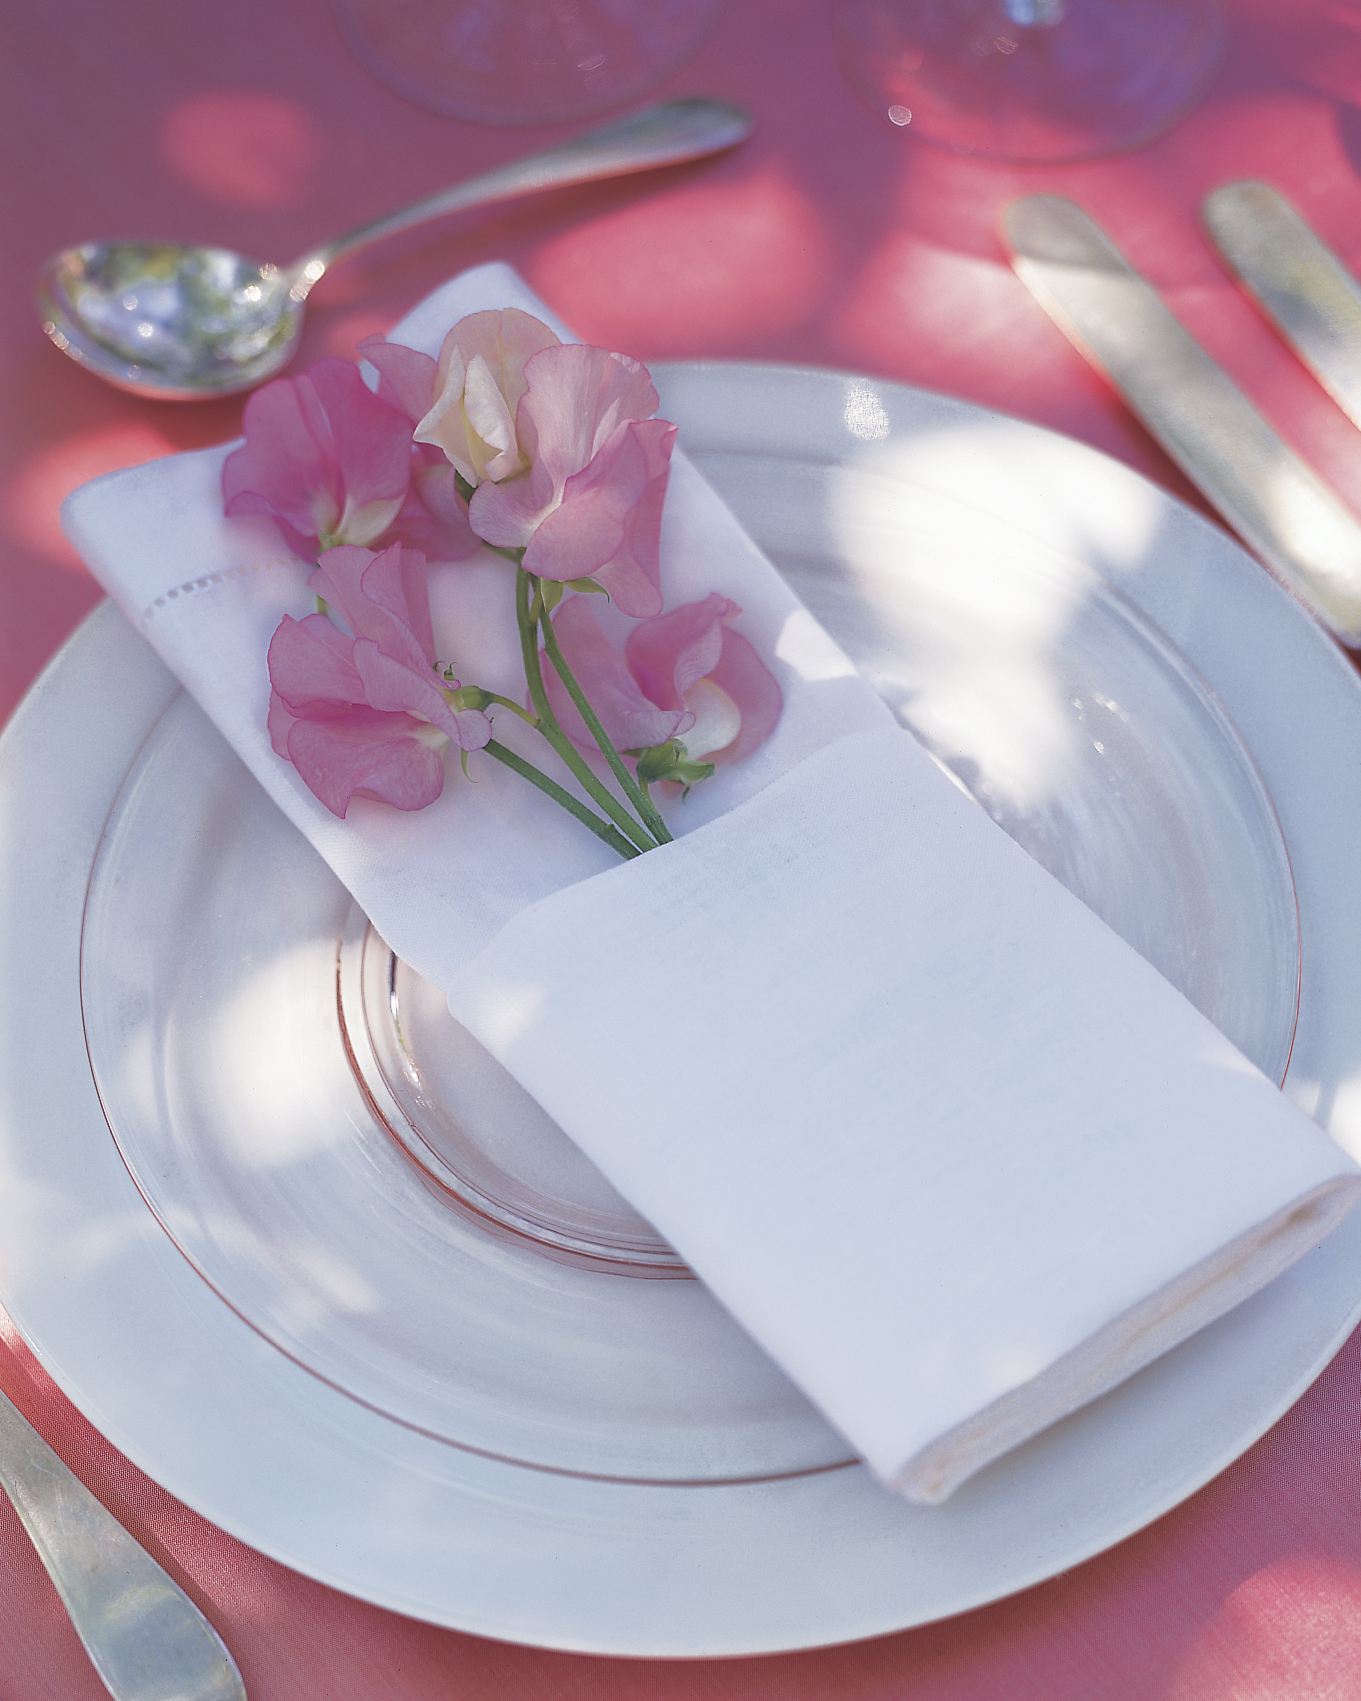 outdoor-wedding-decorations-ml774i22-flower-napkin-0515.jpg